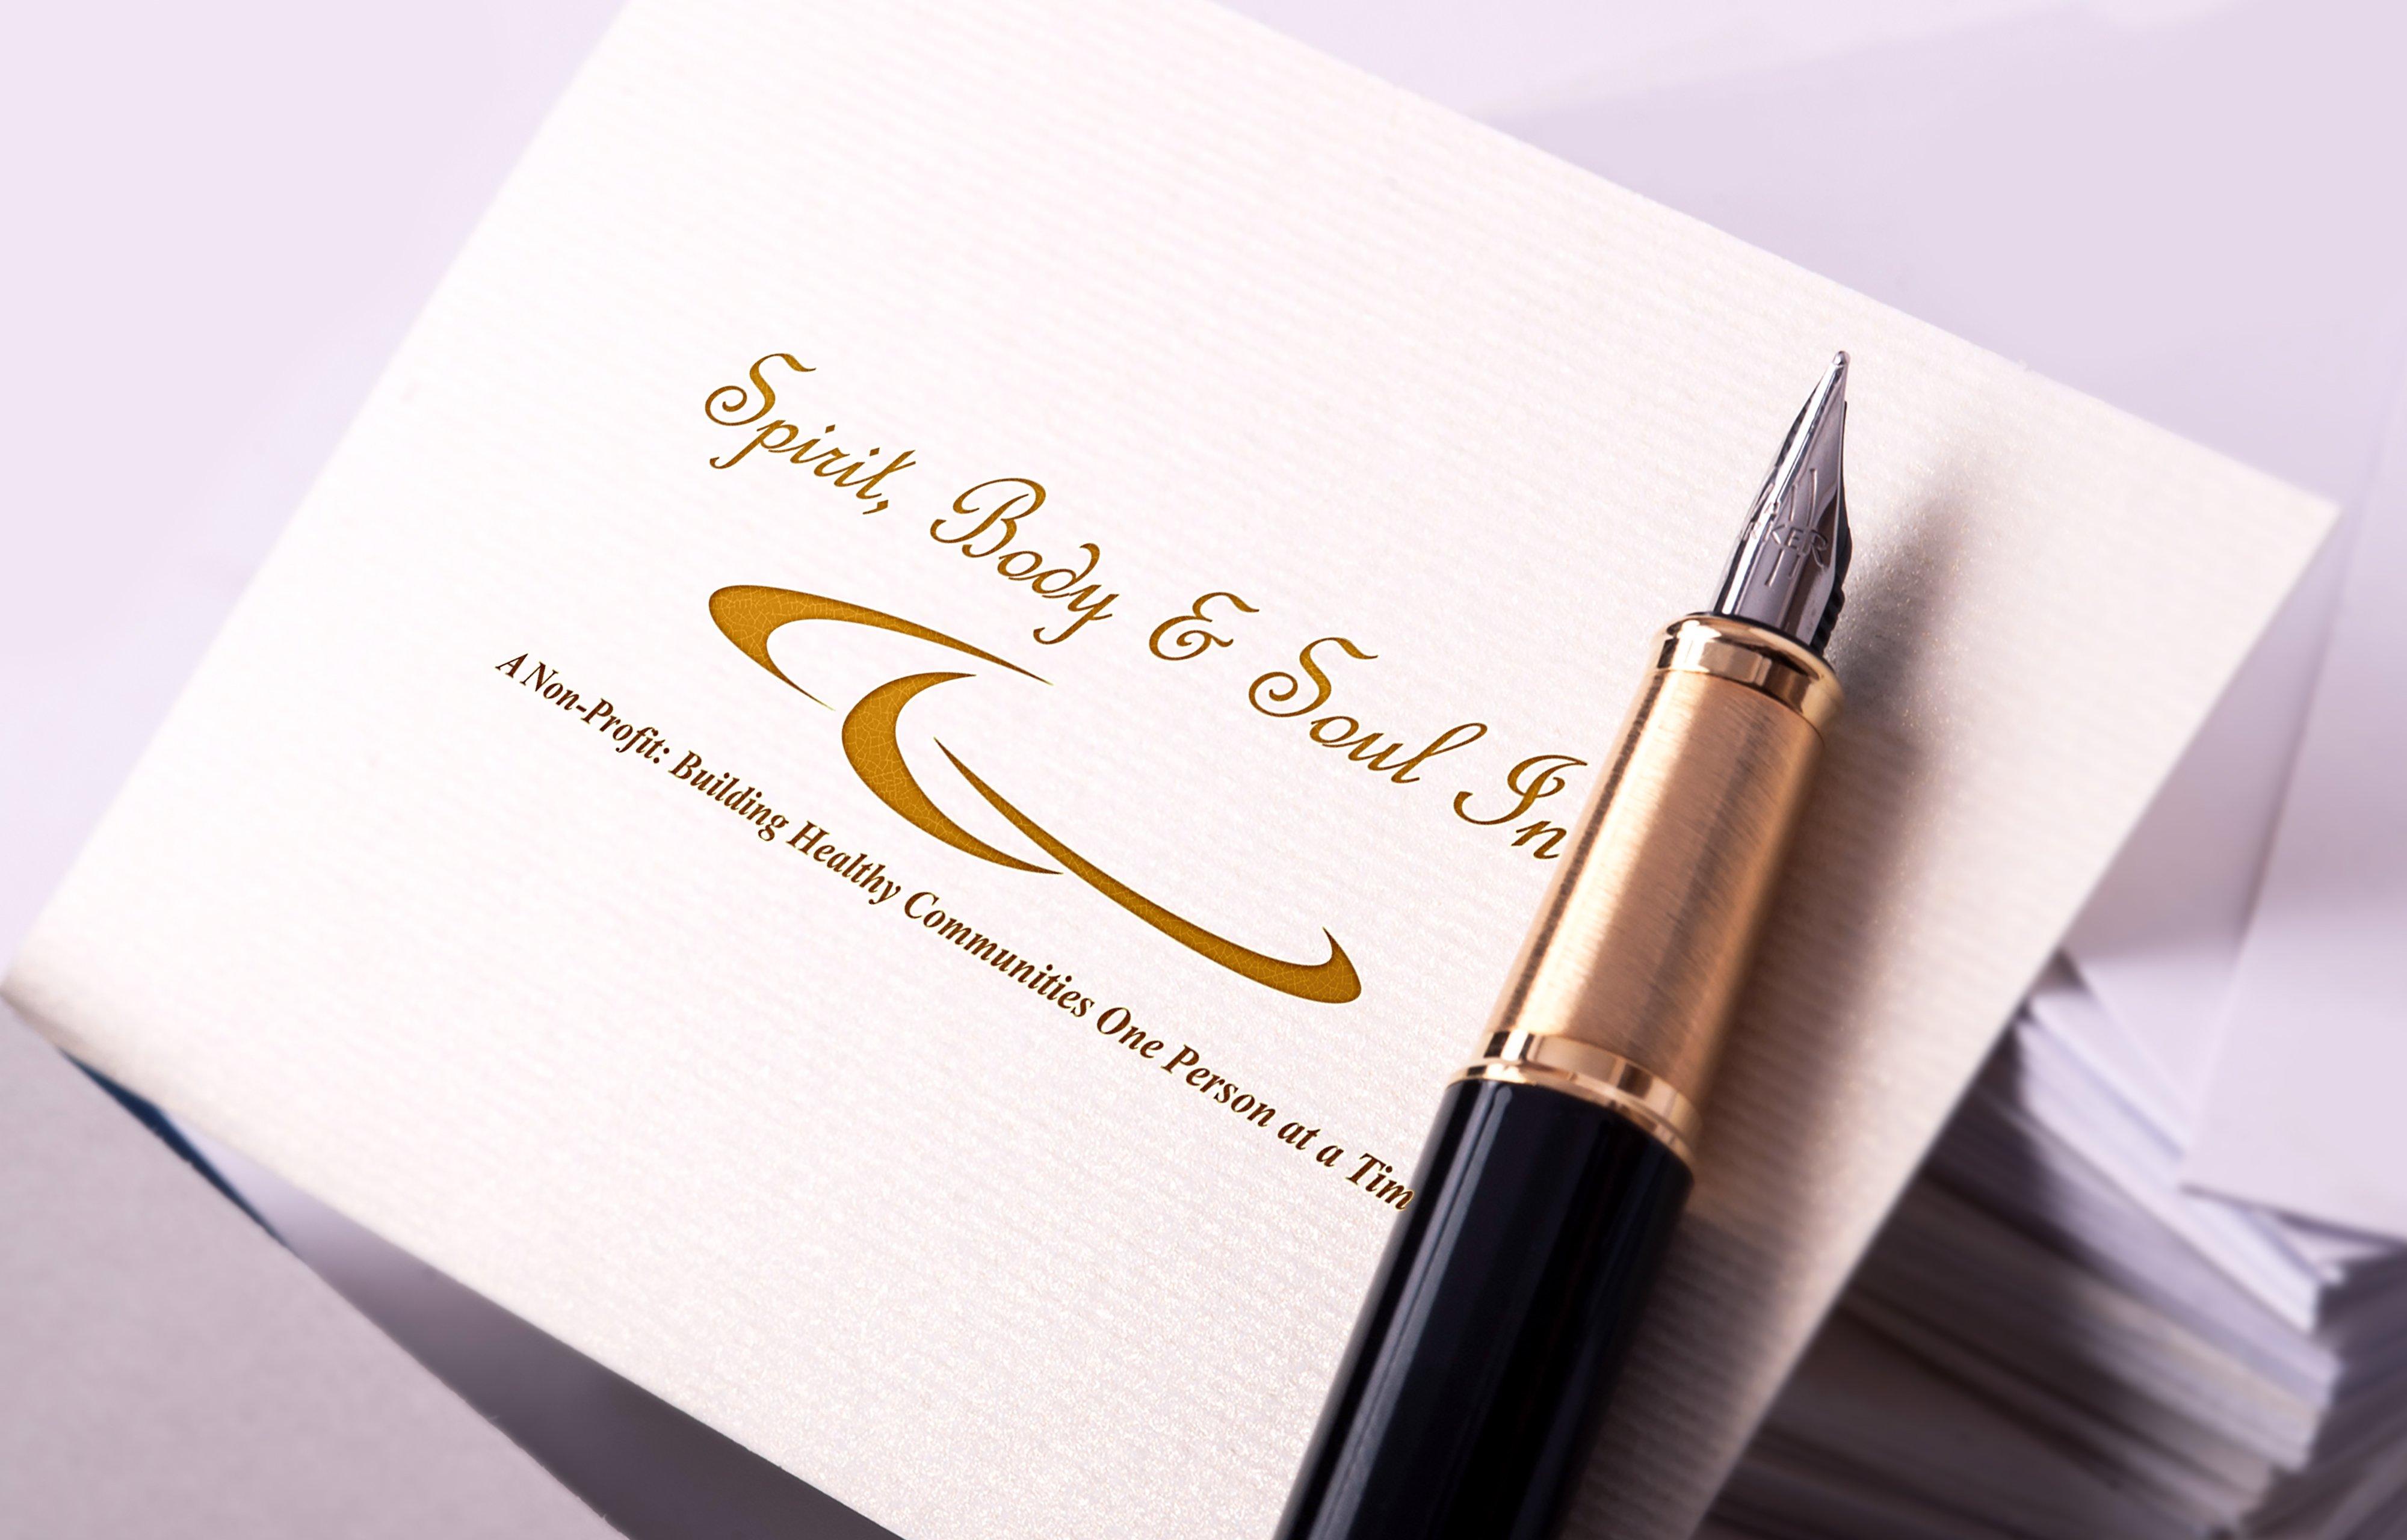 Logo-Design-Spirit-Body-&-Soul